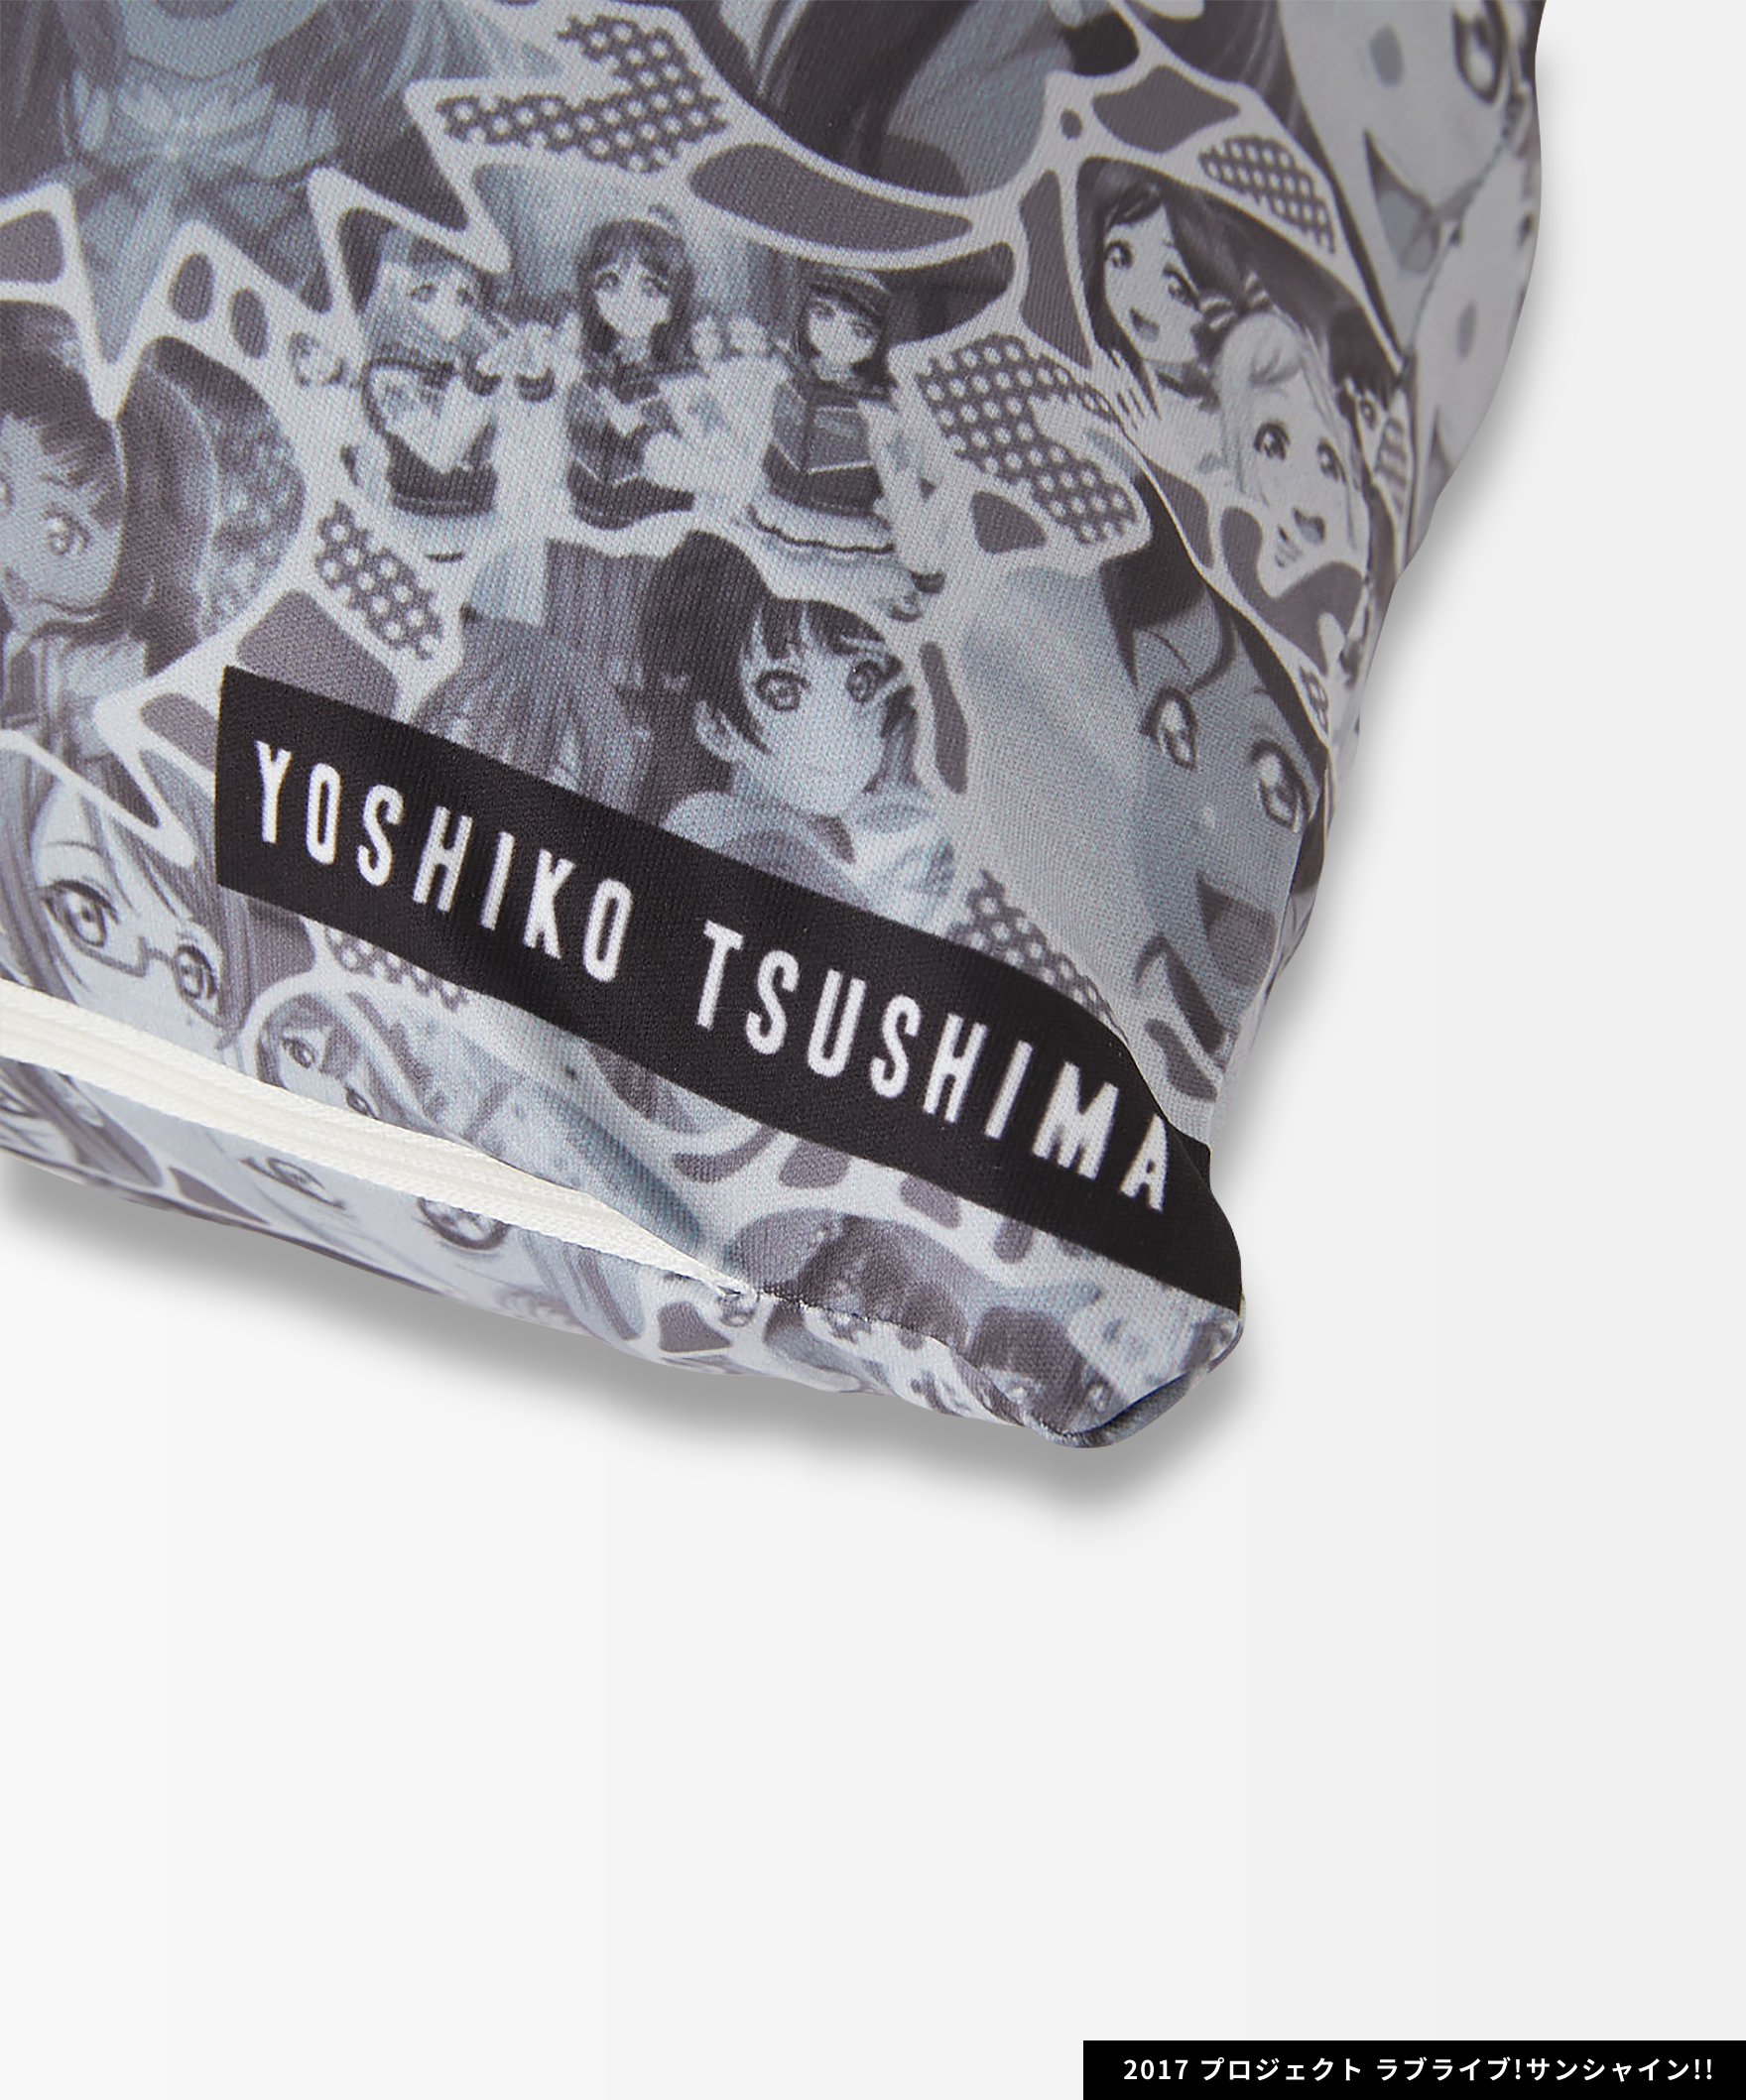 Aqours×R4G Cushion Cover(GRY)